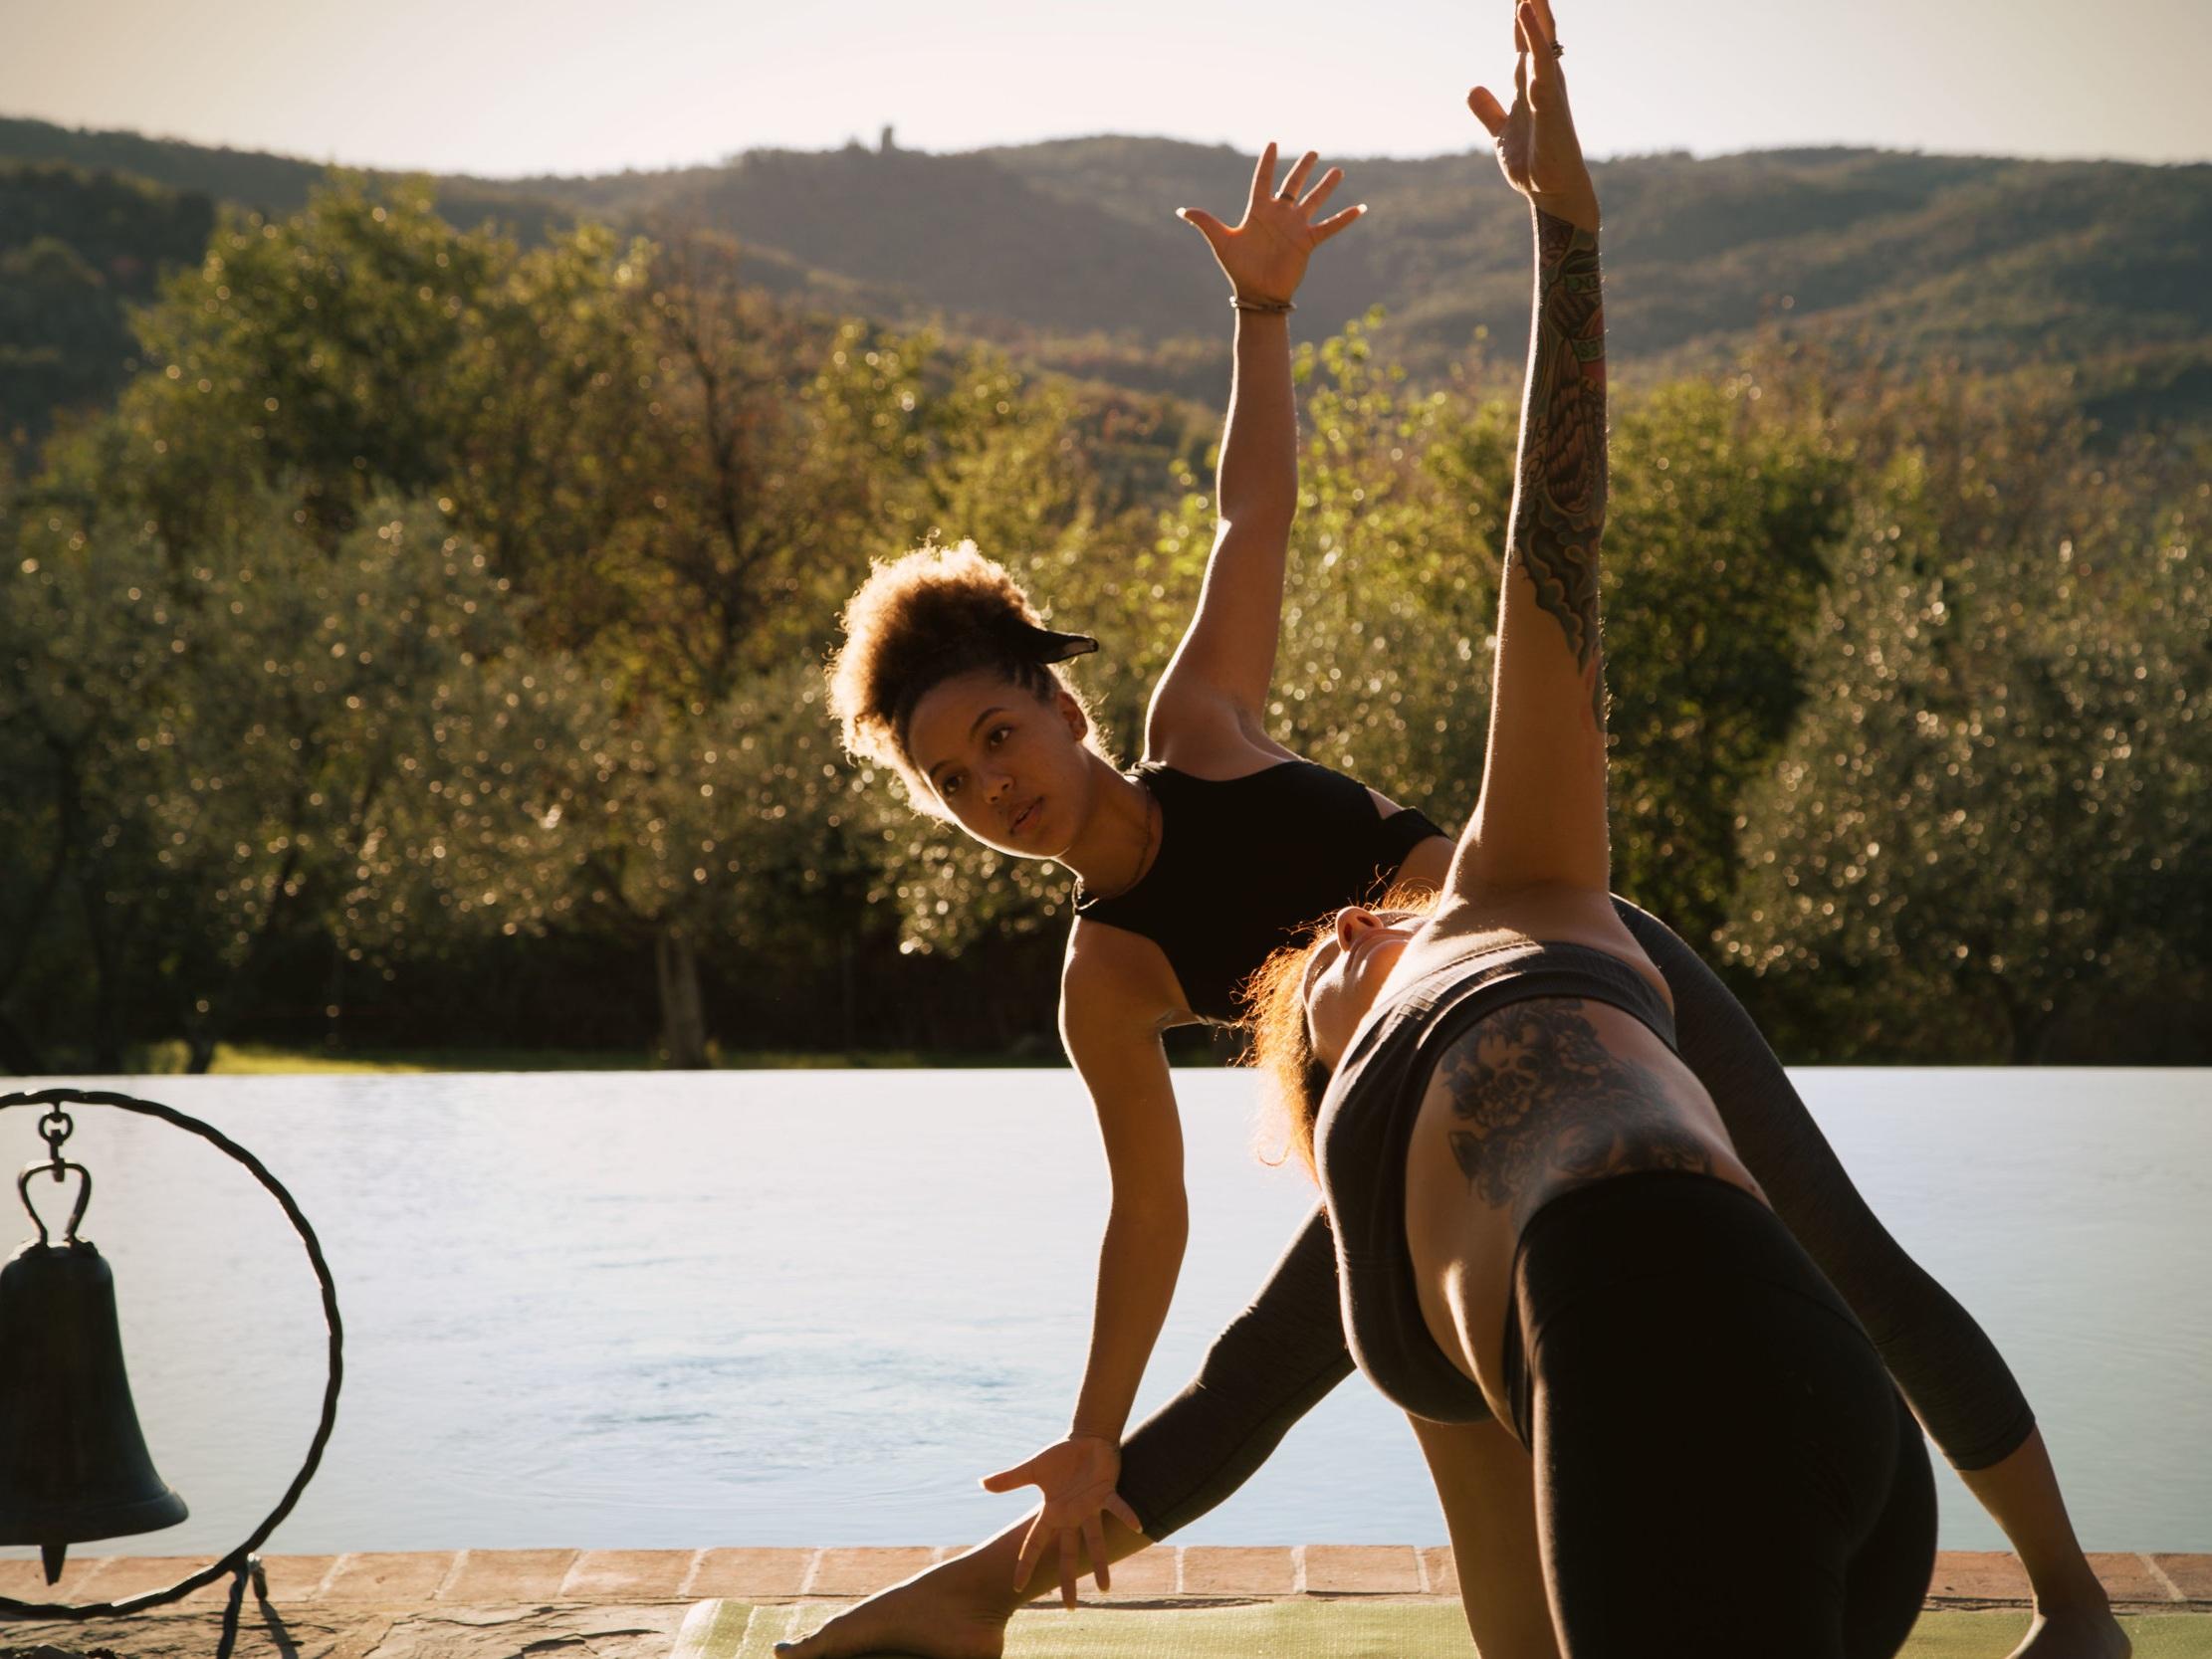 June 19-23, 2019 || Christian Coelho || Tuscany - Yoga, Movement, and inspiration